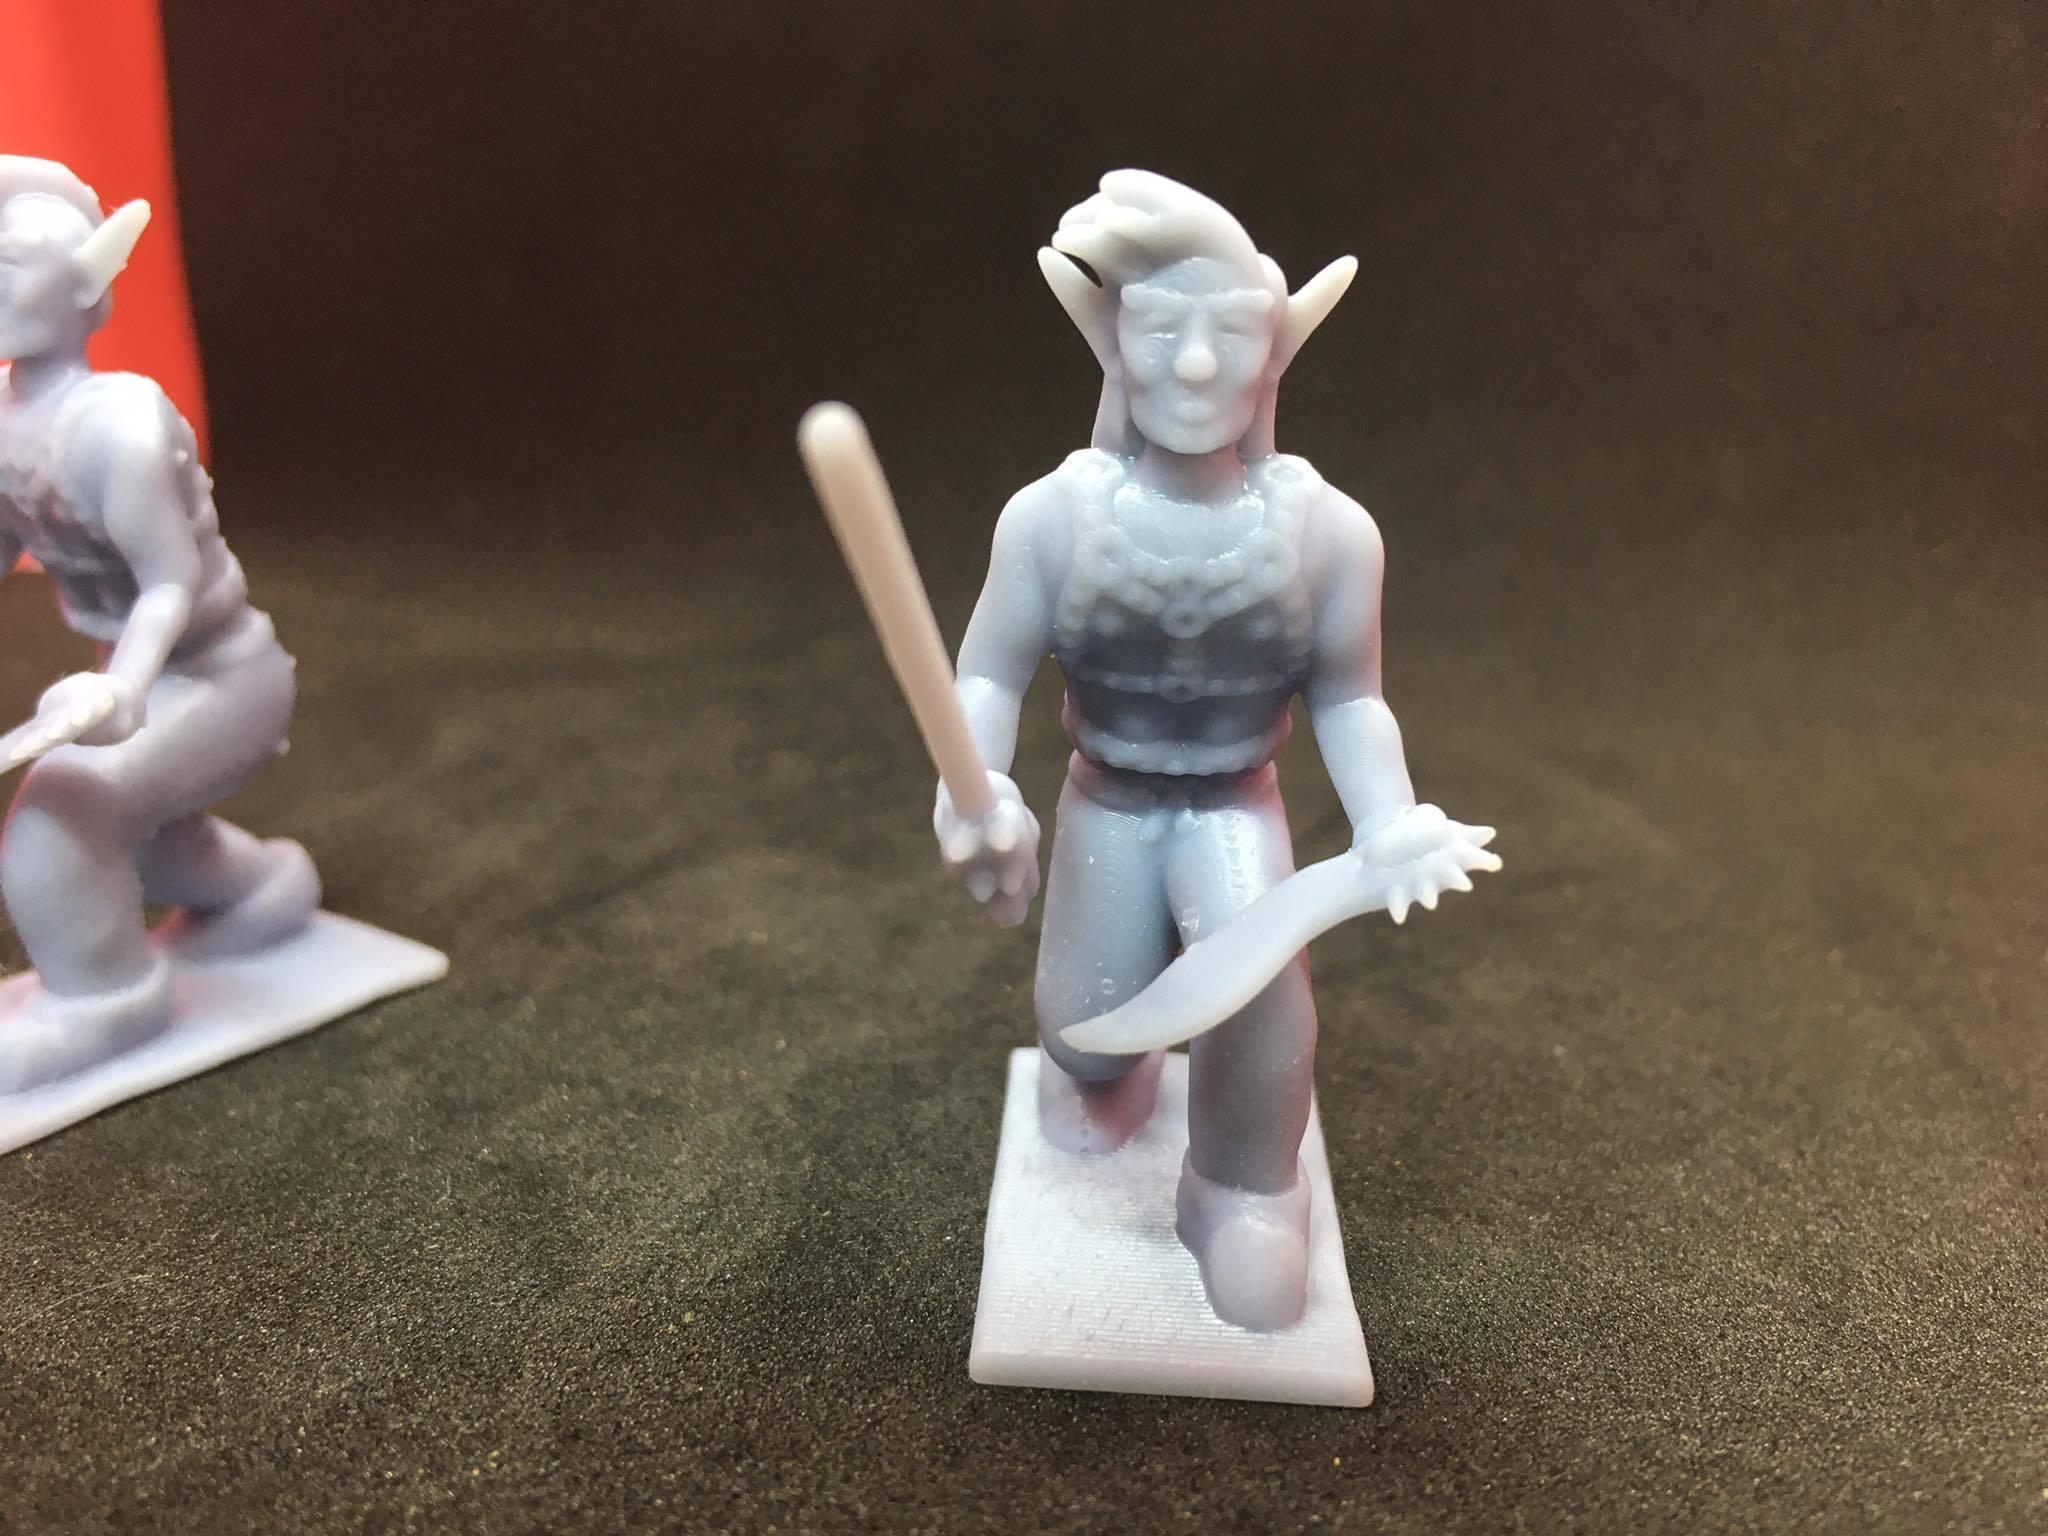 87203335_221965655608486_6758461035478253568_n.jpg Download free STL file Eladrin Elf Rogue • 3D print model, Pza4Rza